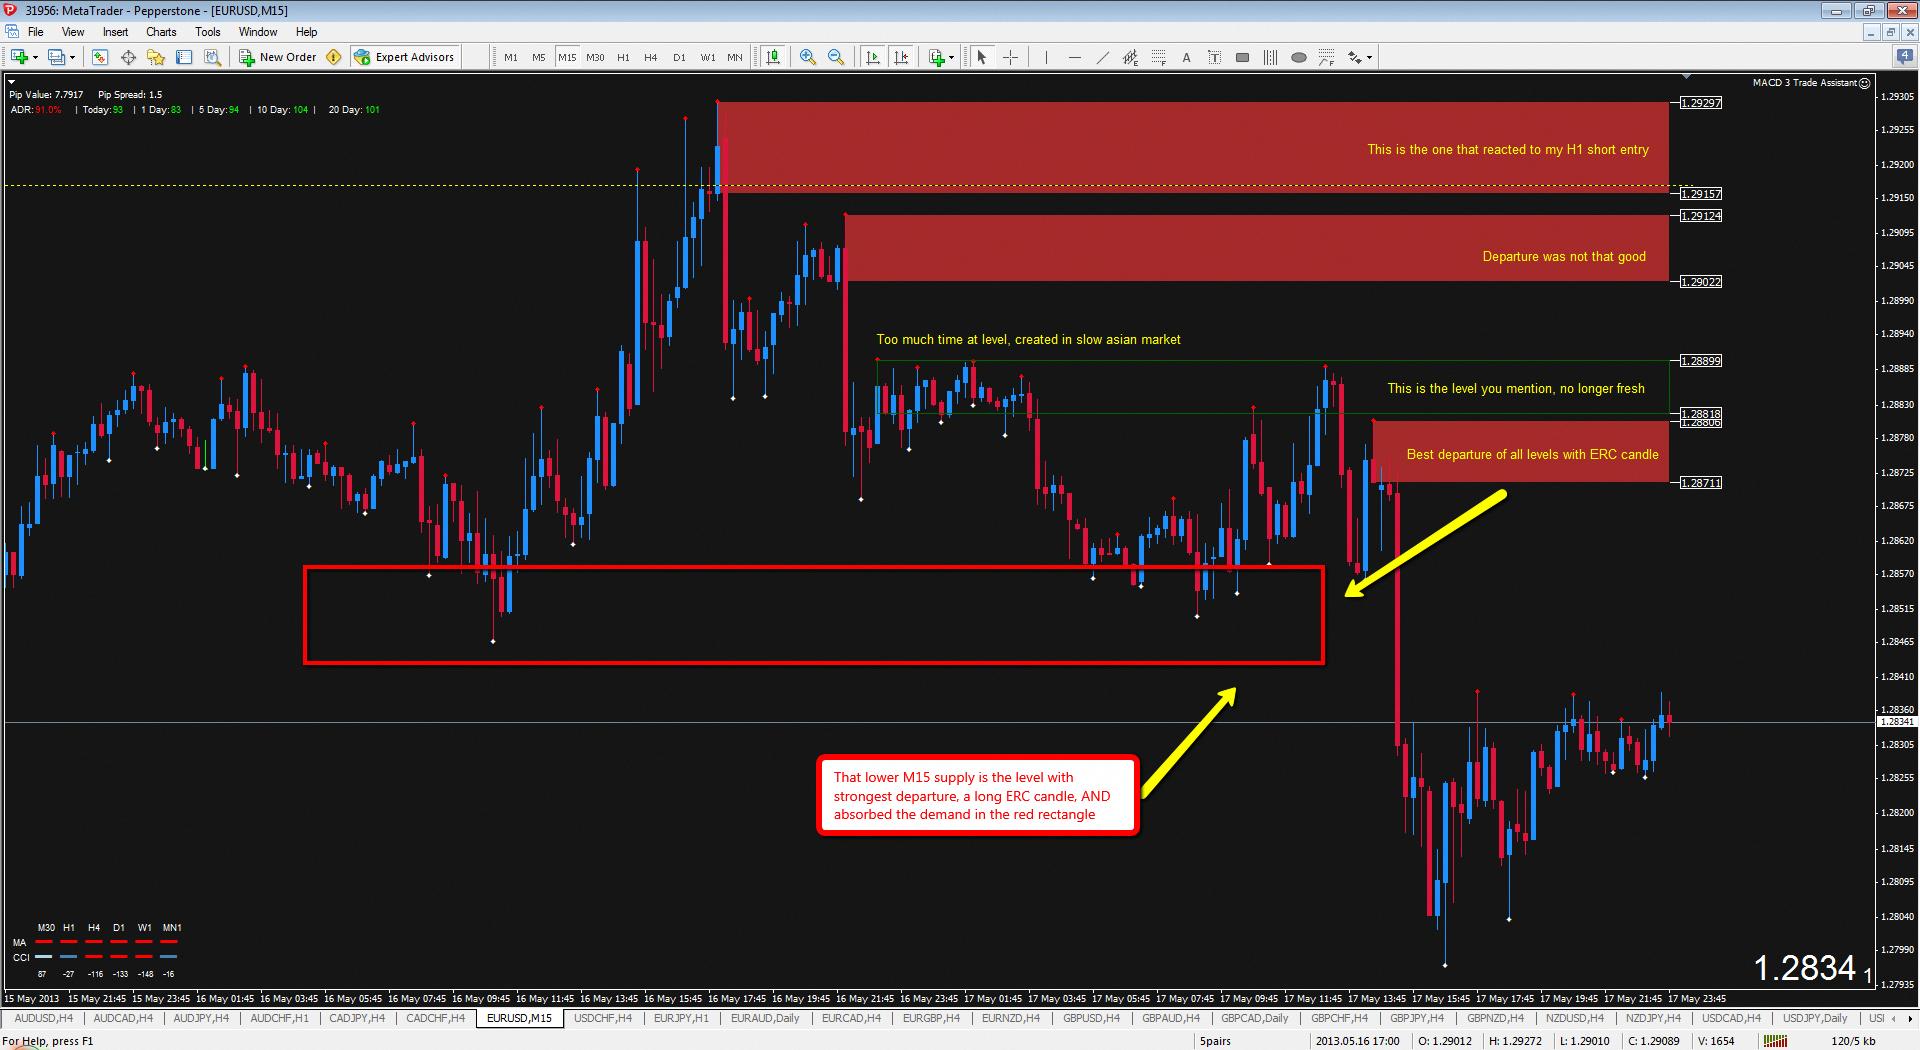 Trading binario trading binario 60 secondi trade minimo 1 1 euro